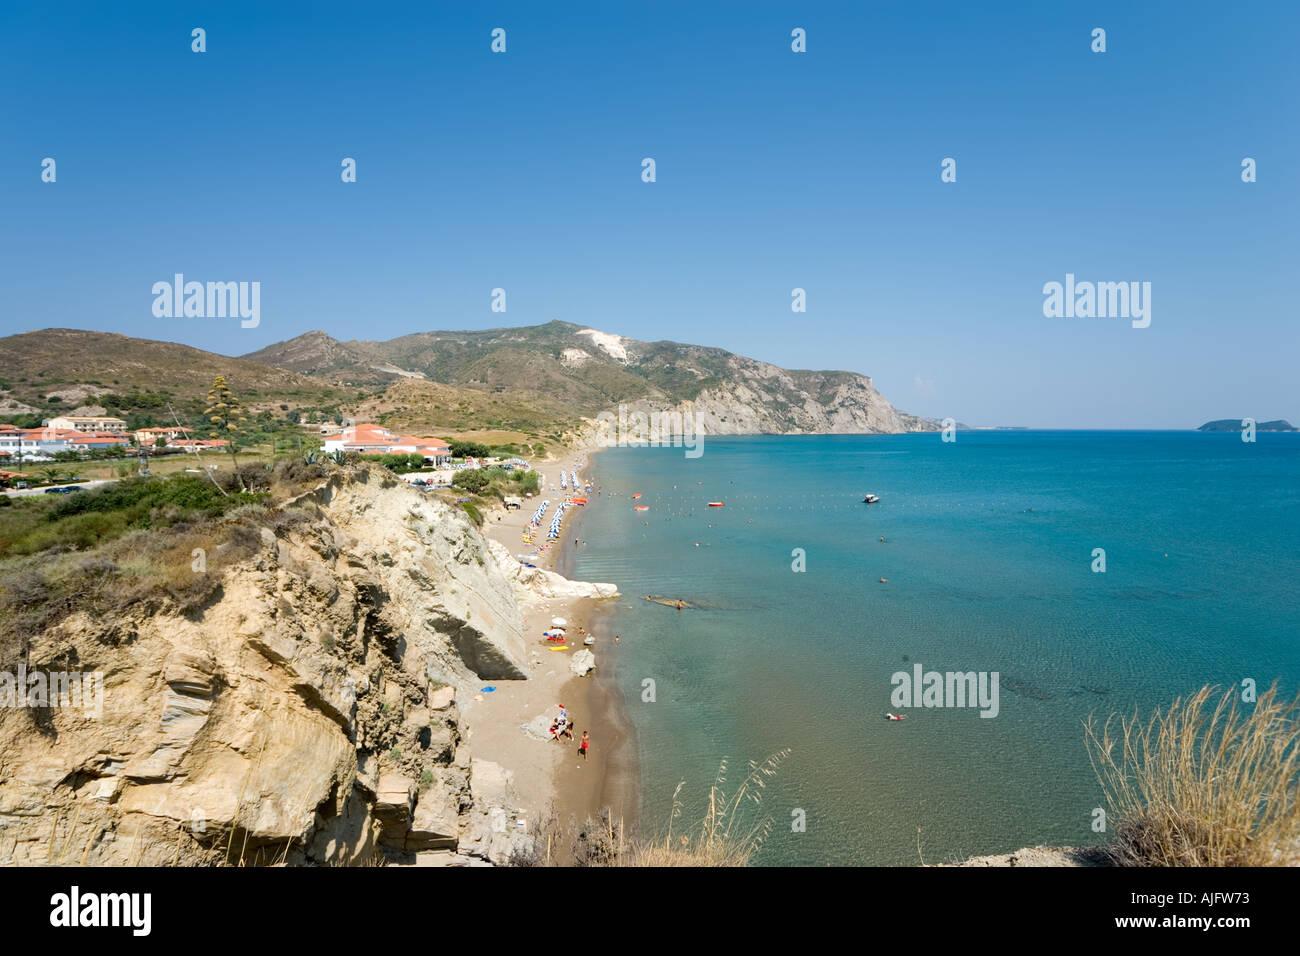 Beach in Kalamaki, Zakynthos, Ionian Islands, Greece - Stock Image